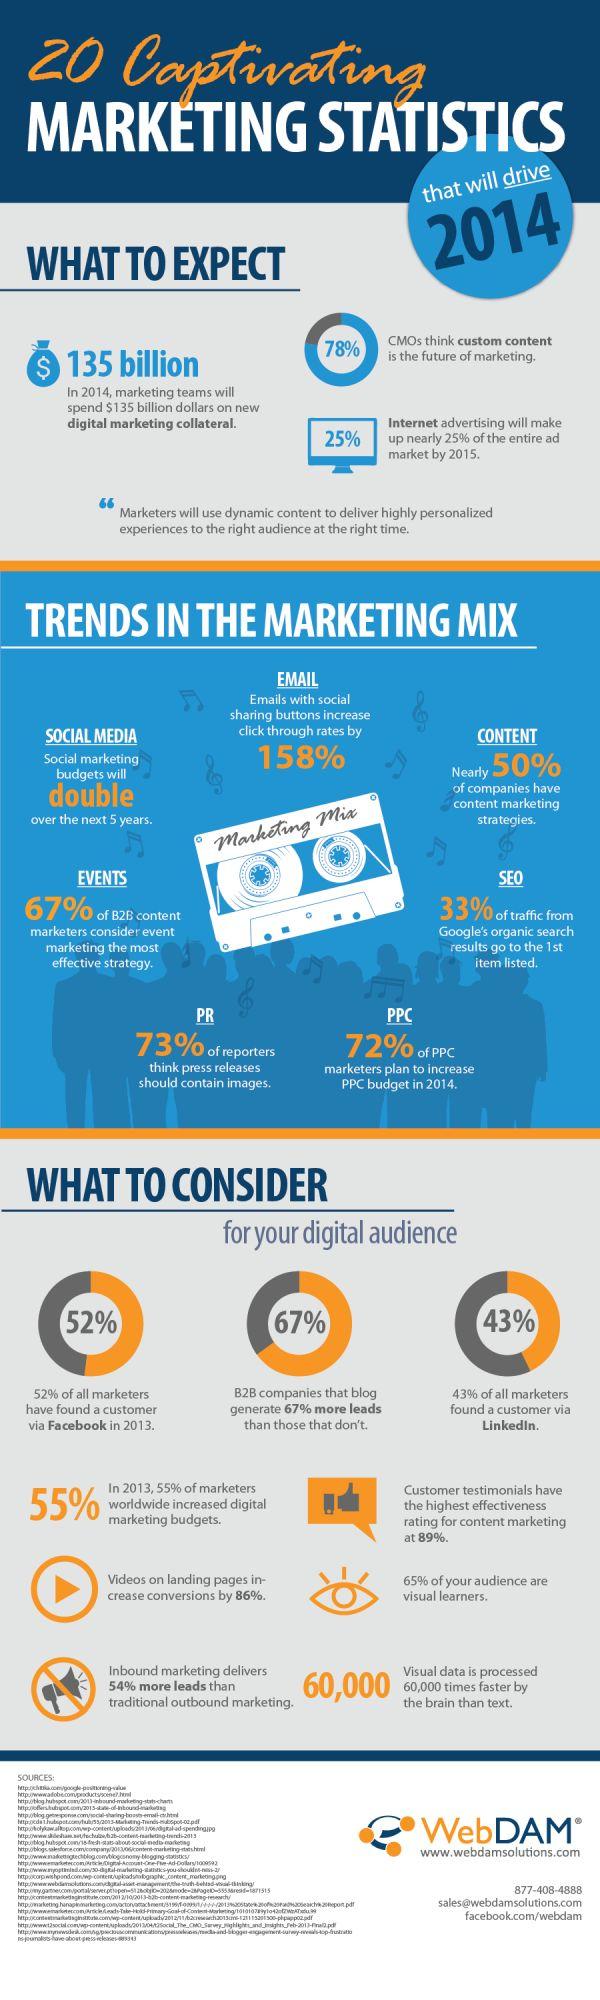 20 Marketing Statistics